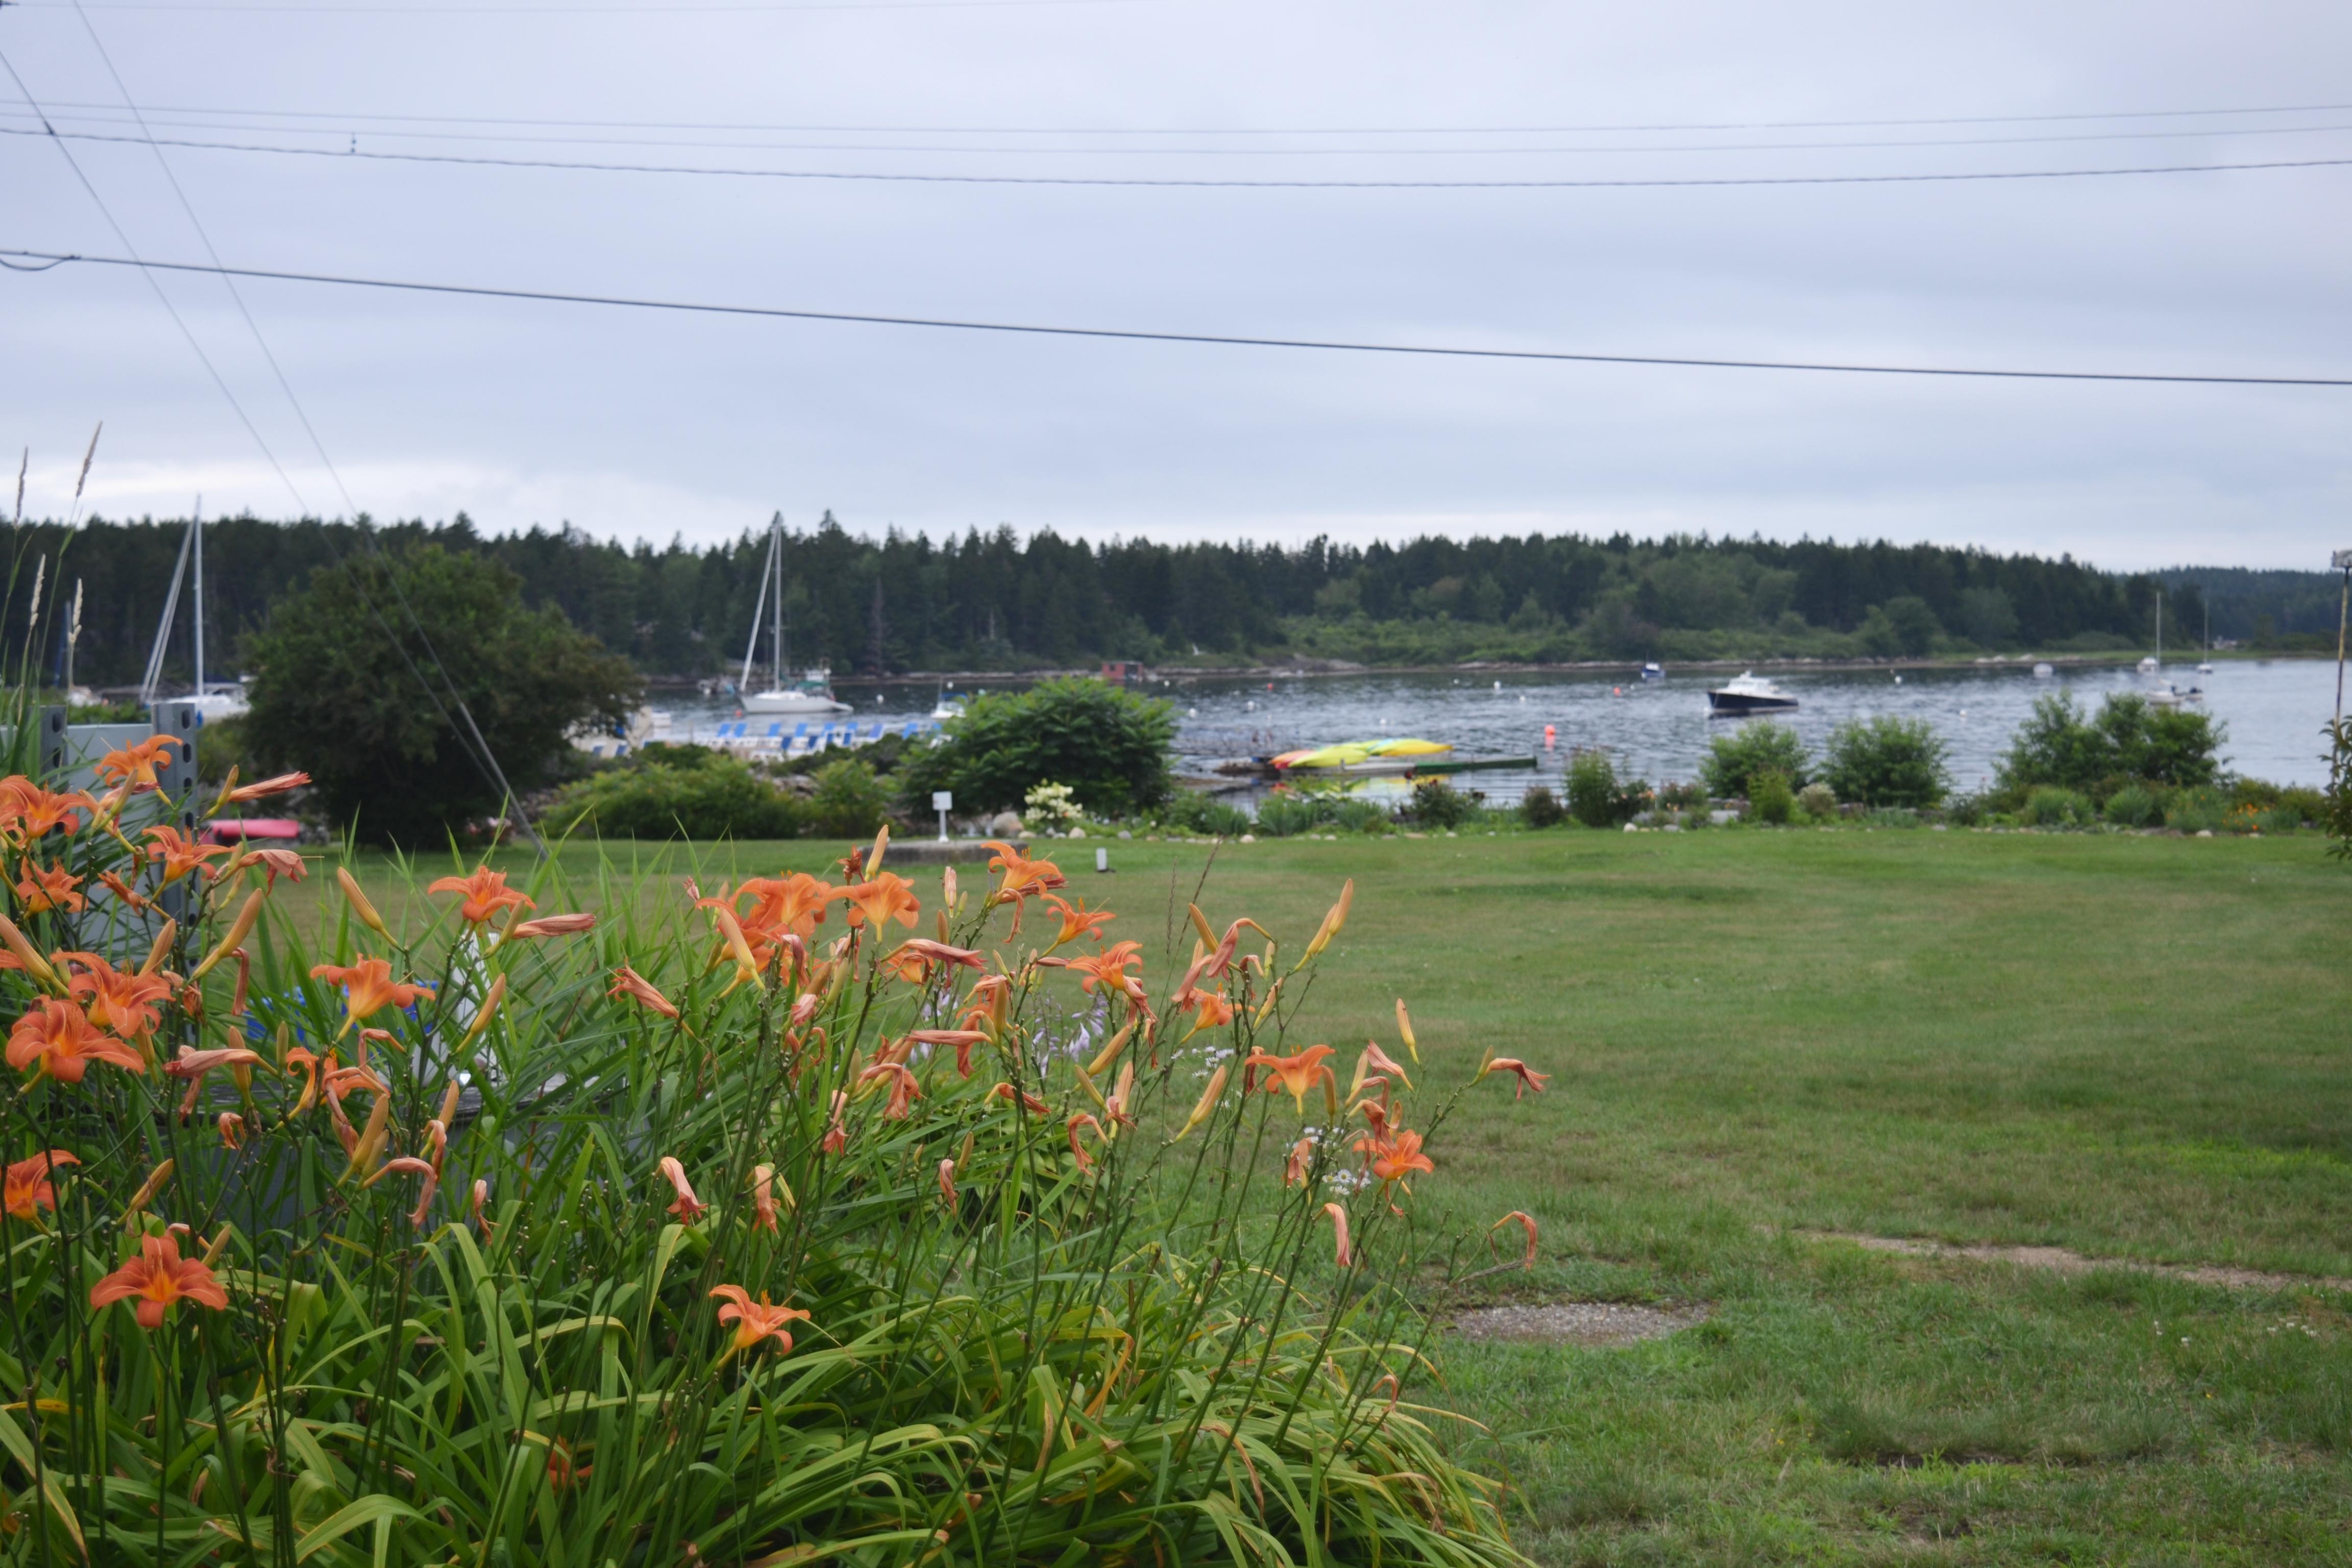 Sebasco Harbor Resort has gorgeous water views.